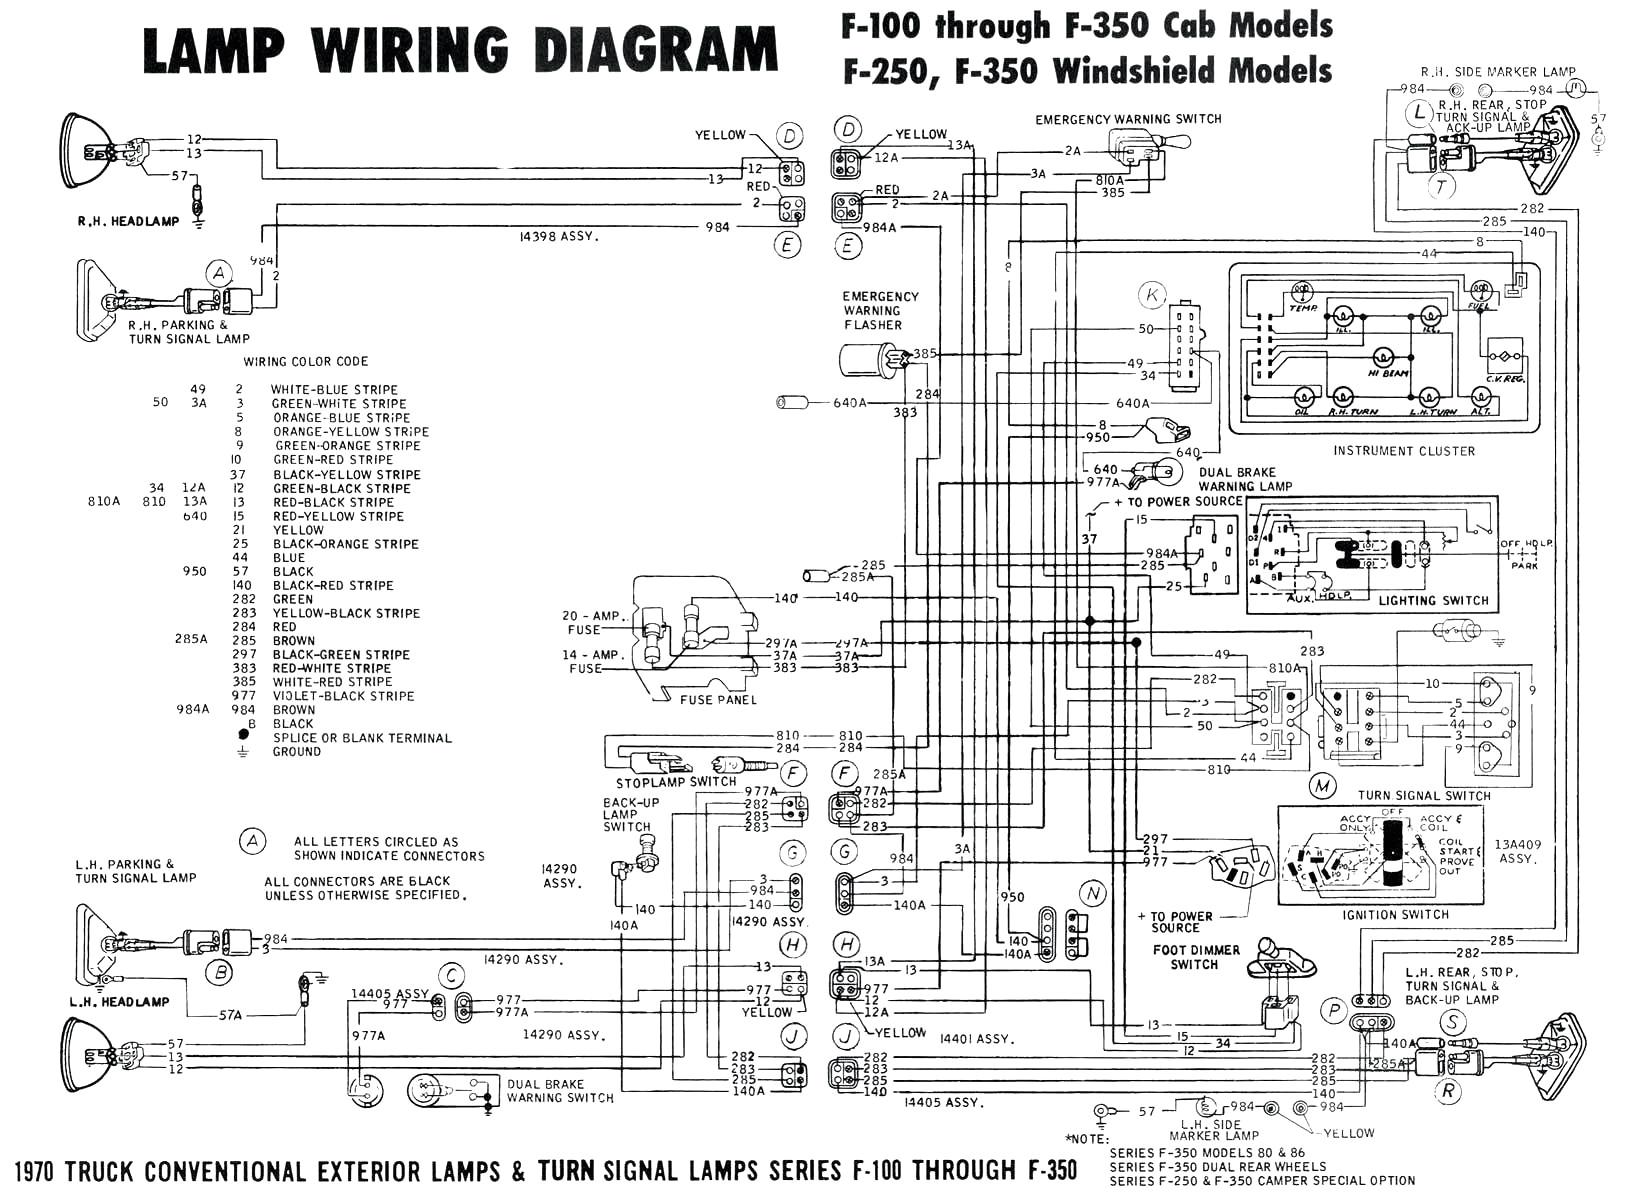 wiring diagram 2006 hyundai sonata wiring diagrams ments 2012 hyundai sonata radio wiring diagram wiring diagram